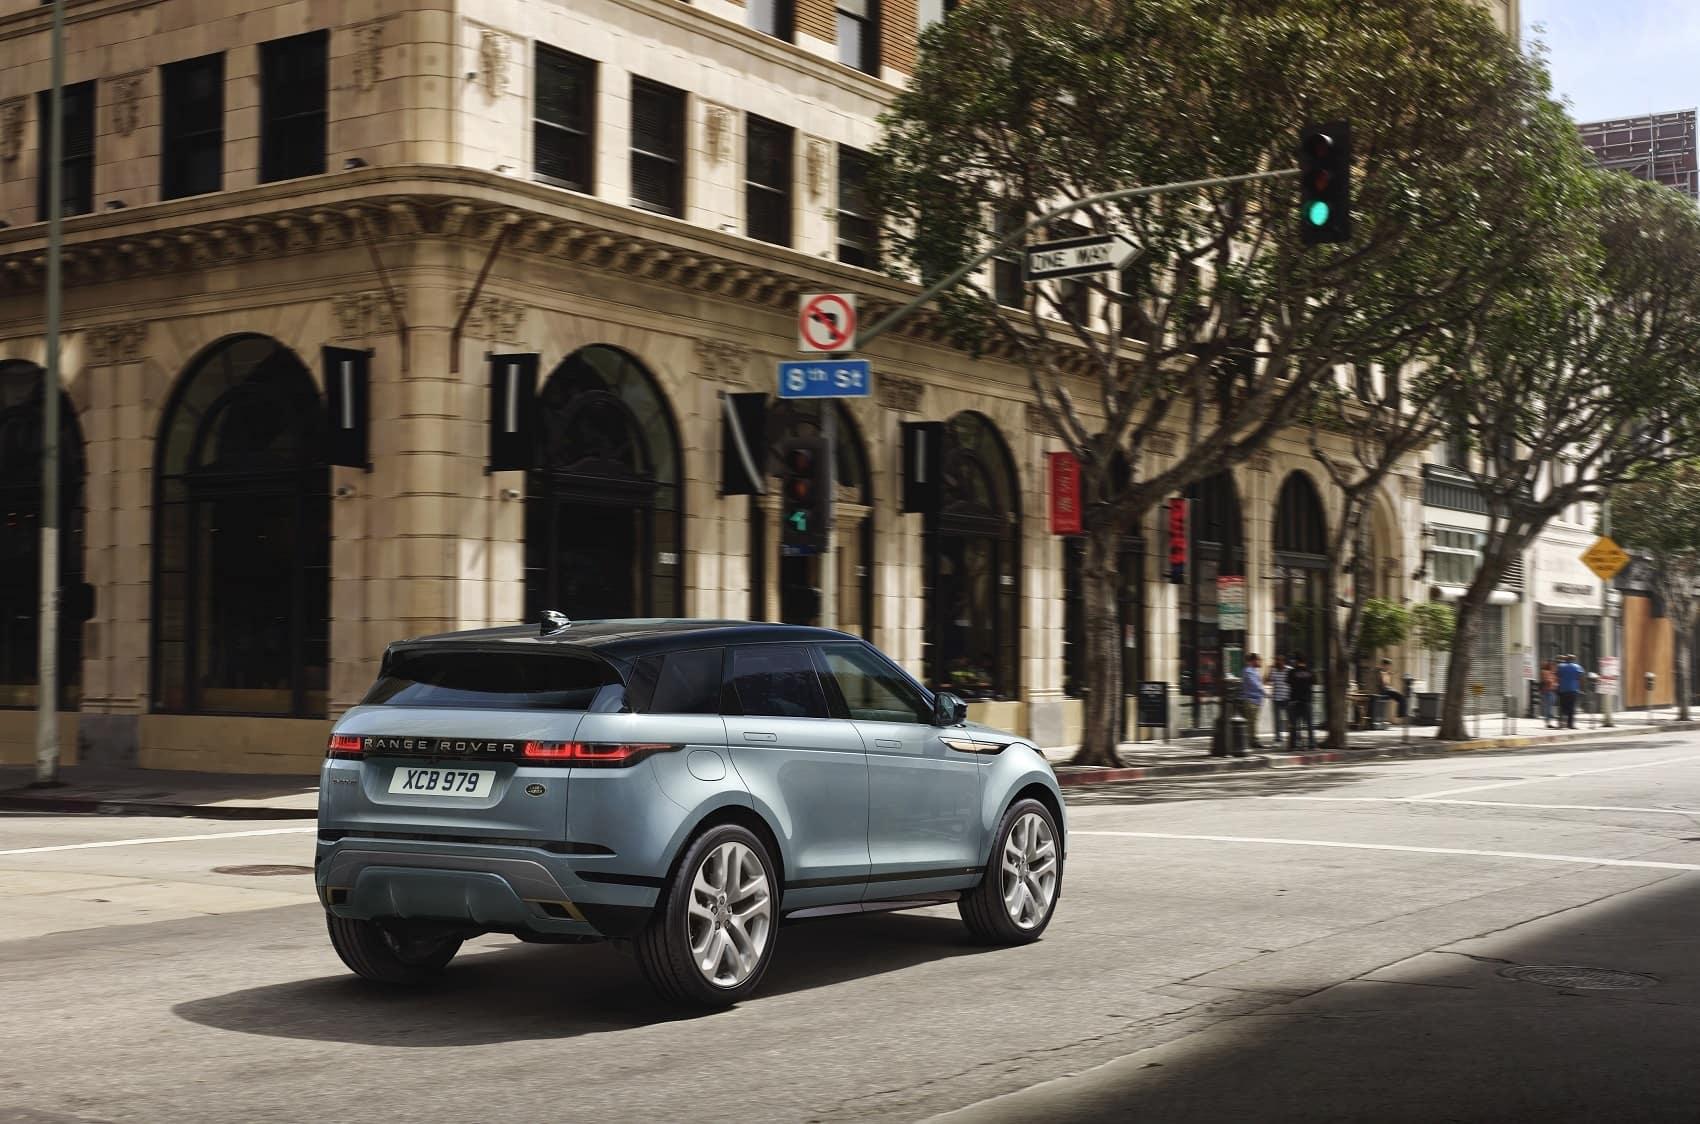 Range Rover Evoque Performance Features